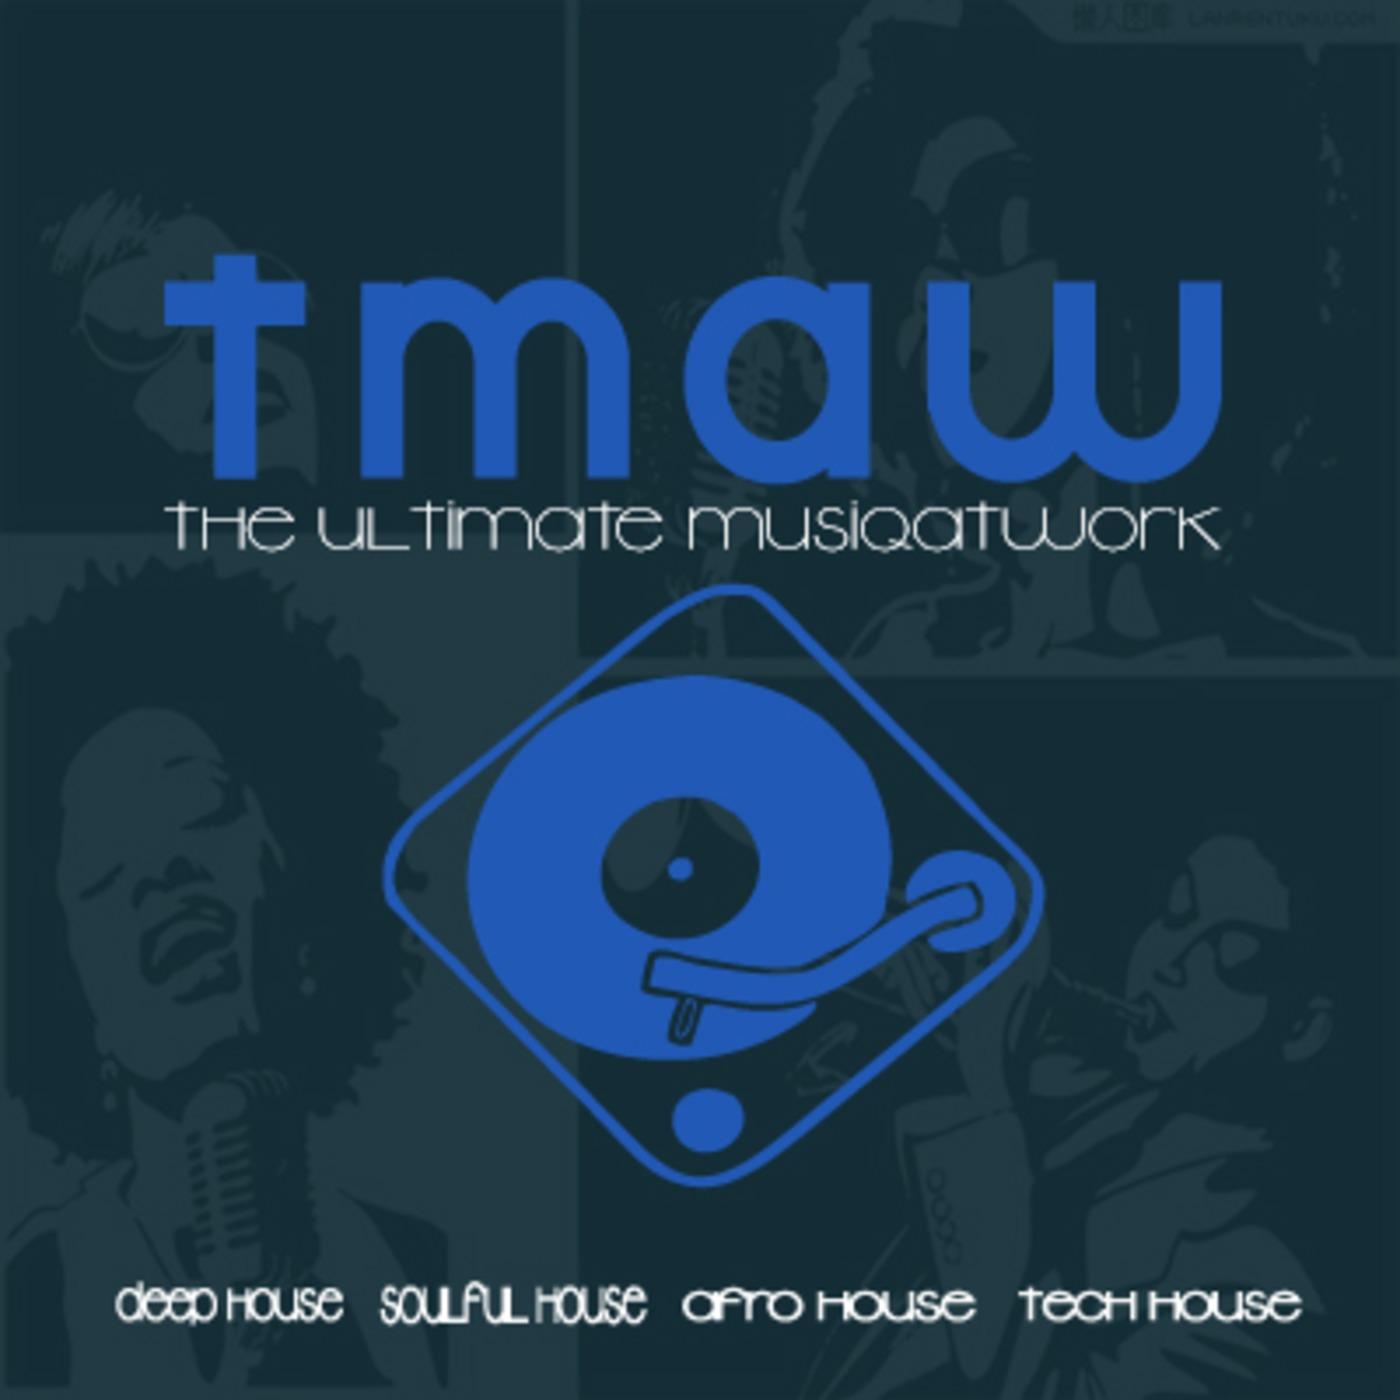 TheUltmateMusiQatWork